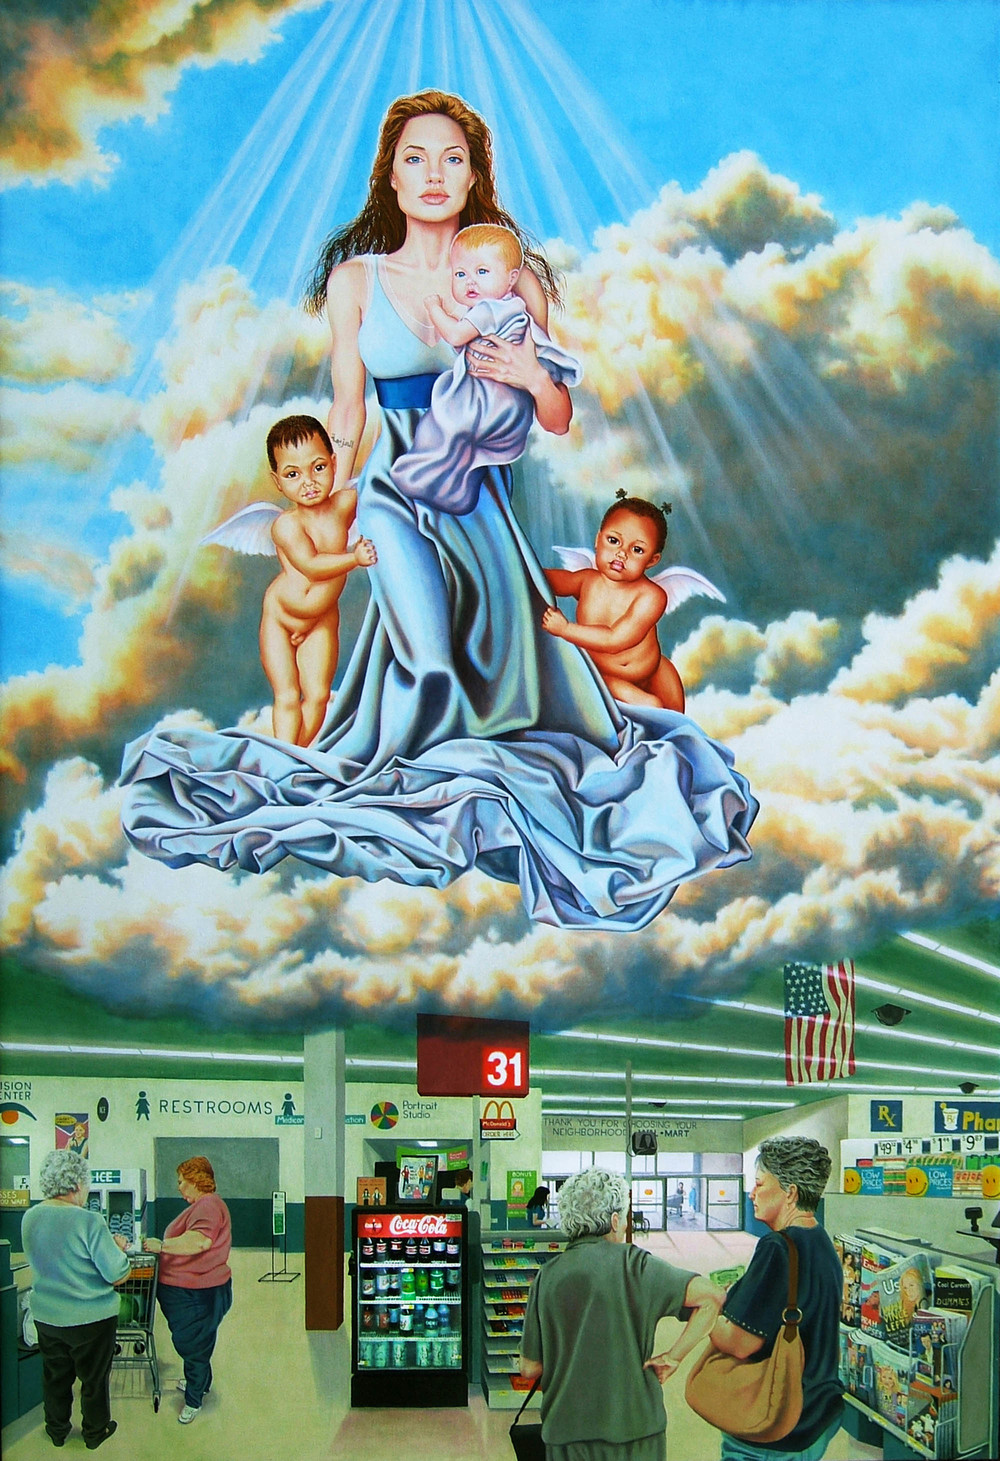 angelina-jolie-blessed-art-thou-kate-kretz